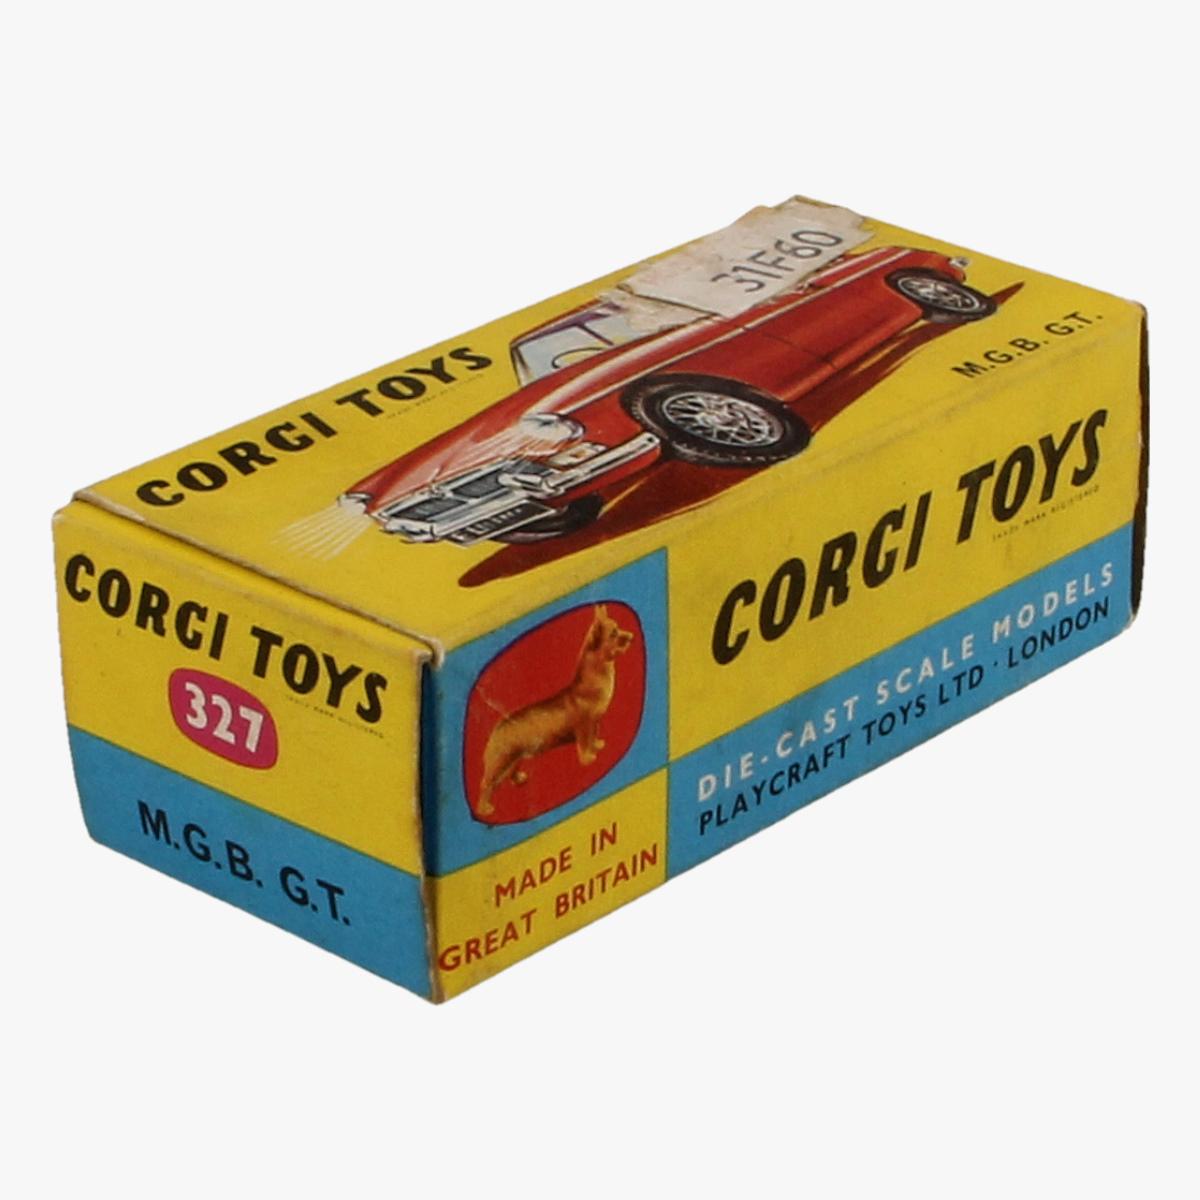 Afbeeldingen van Corgi Toys. M.G.B. G.T. Nr. 327